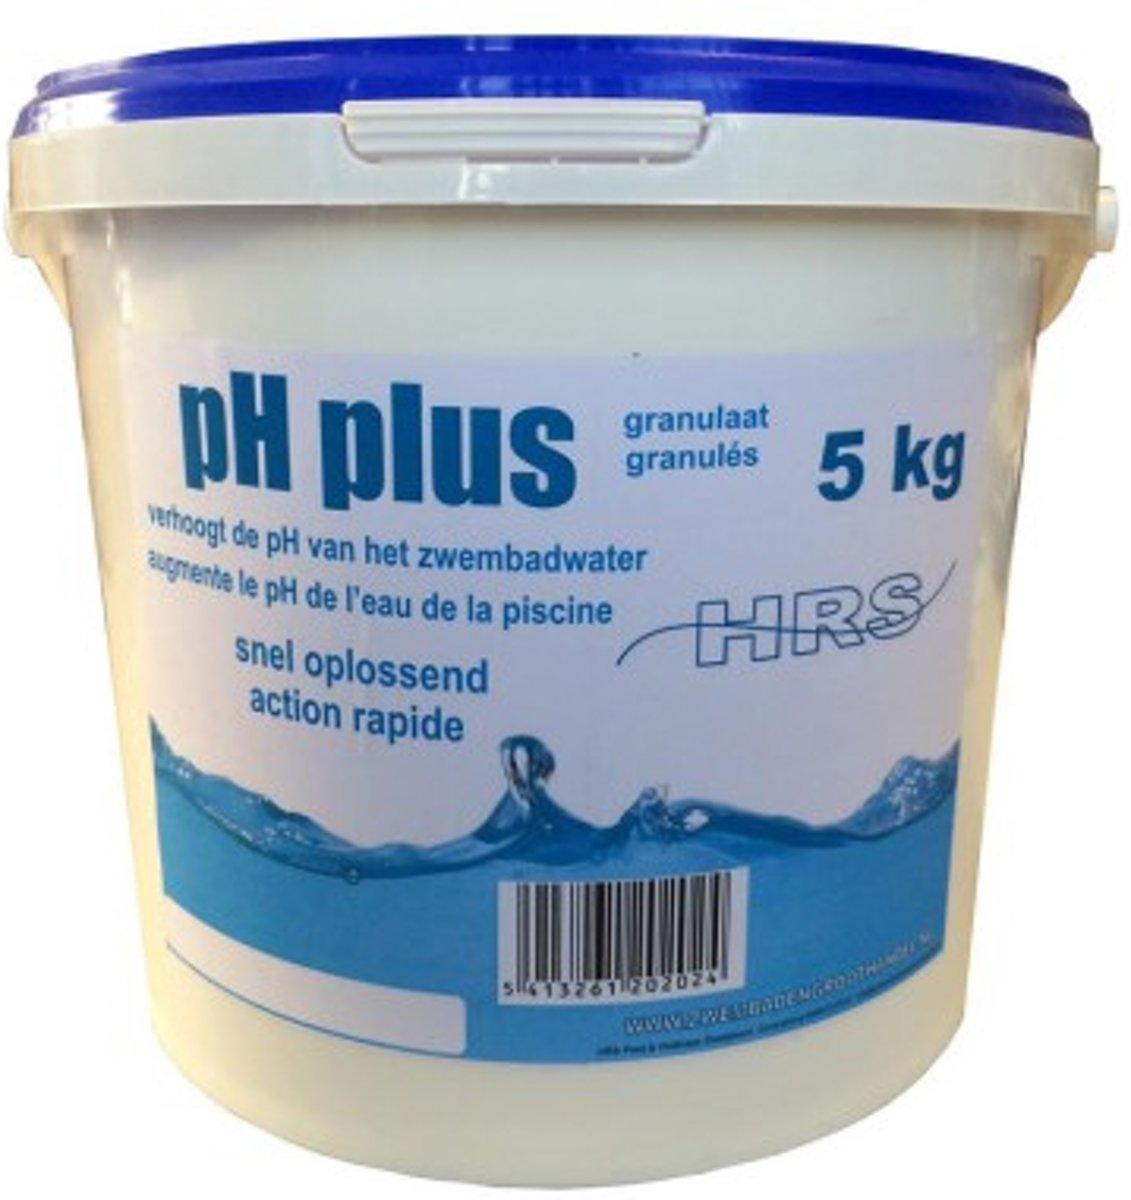 Ph plus - Zwembad - Onderhoud - PH waarde - 5kg - Ph plus - Zwembadwater